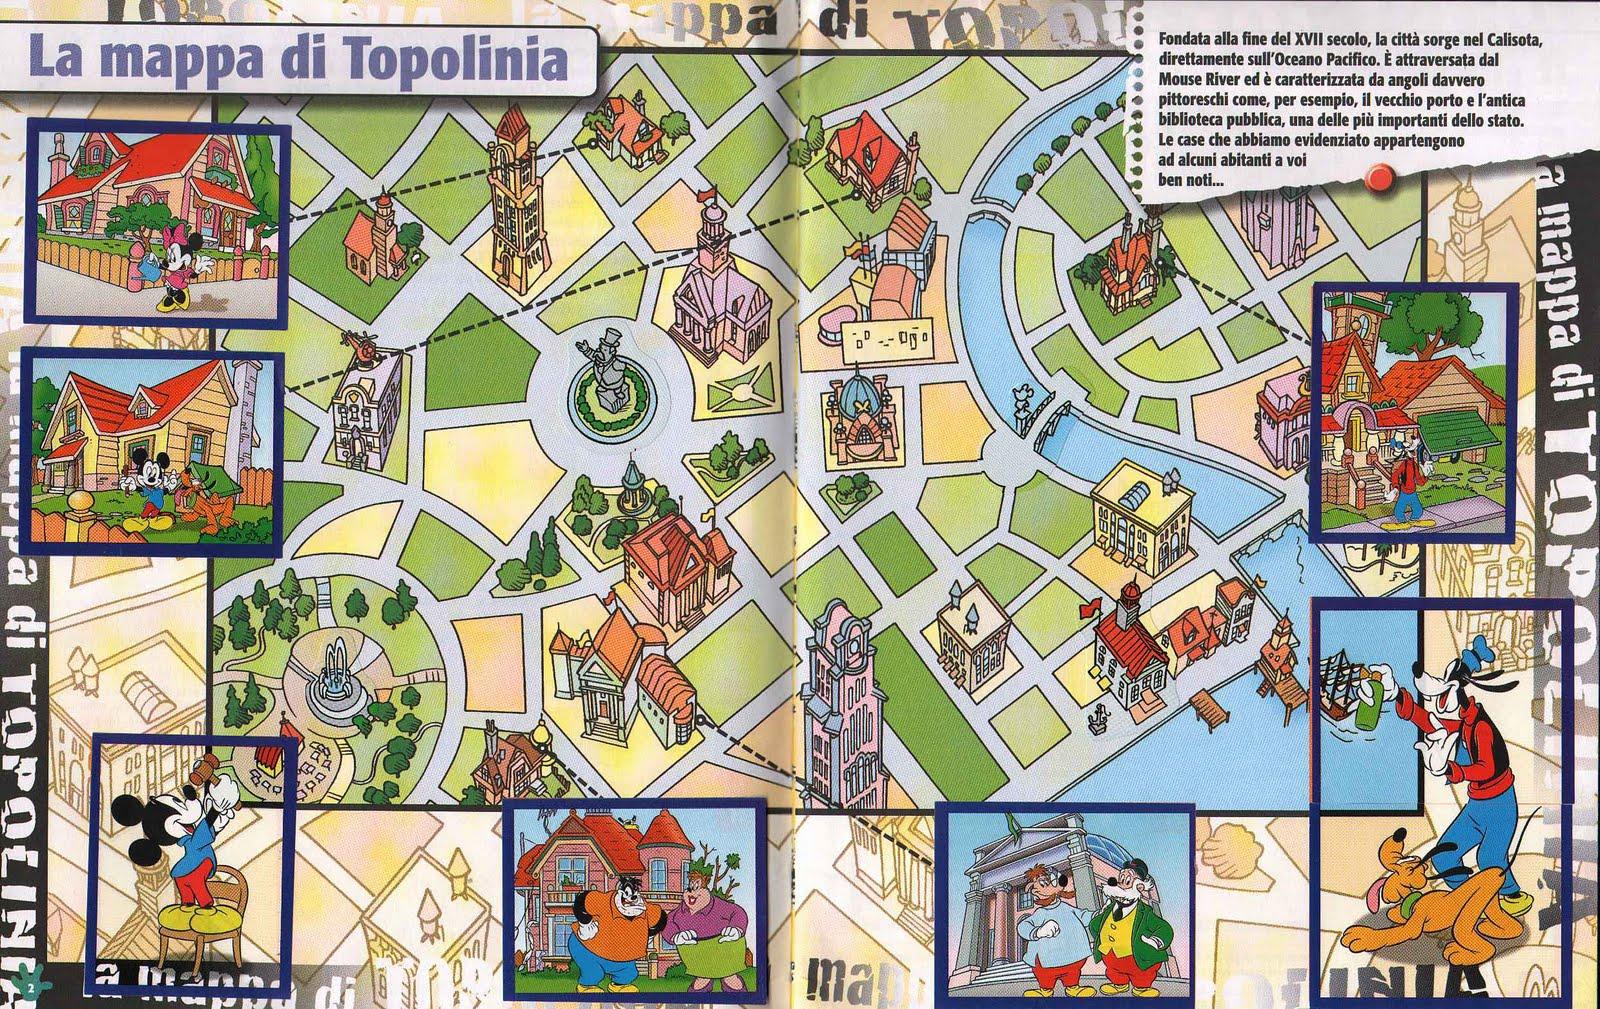 Topolinia